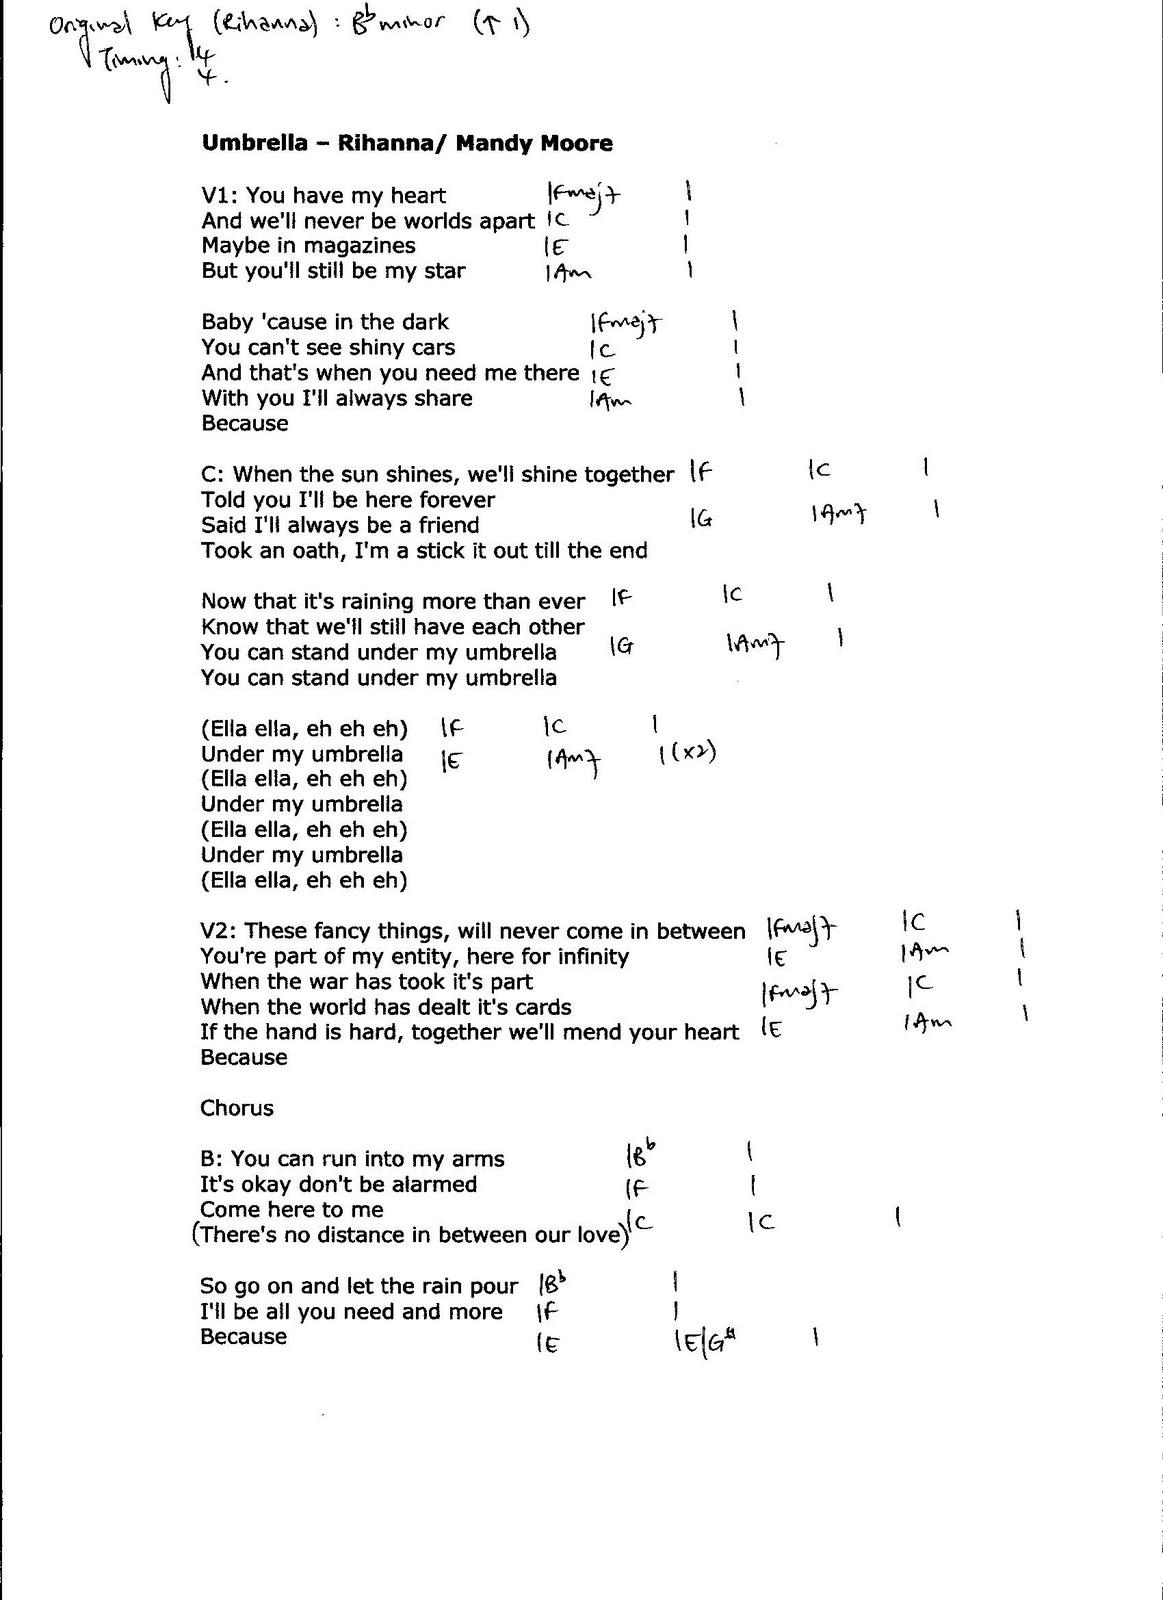 Providing Accurate Chords Umbrella Rihanna